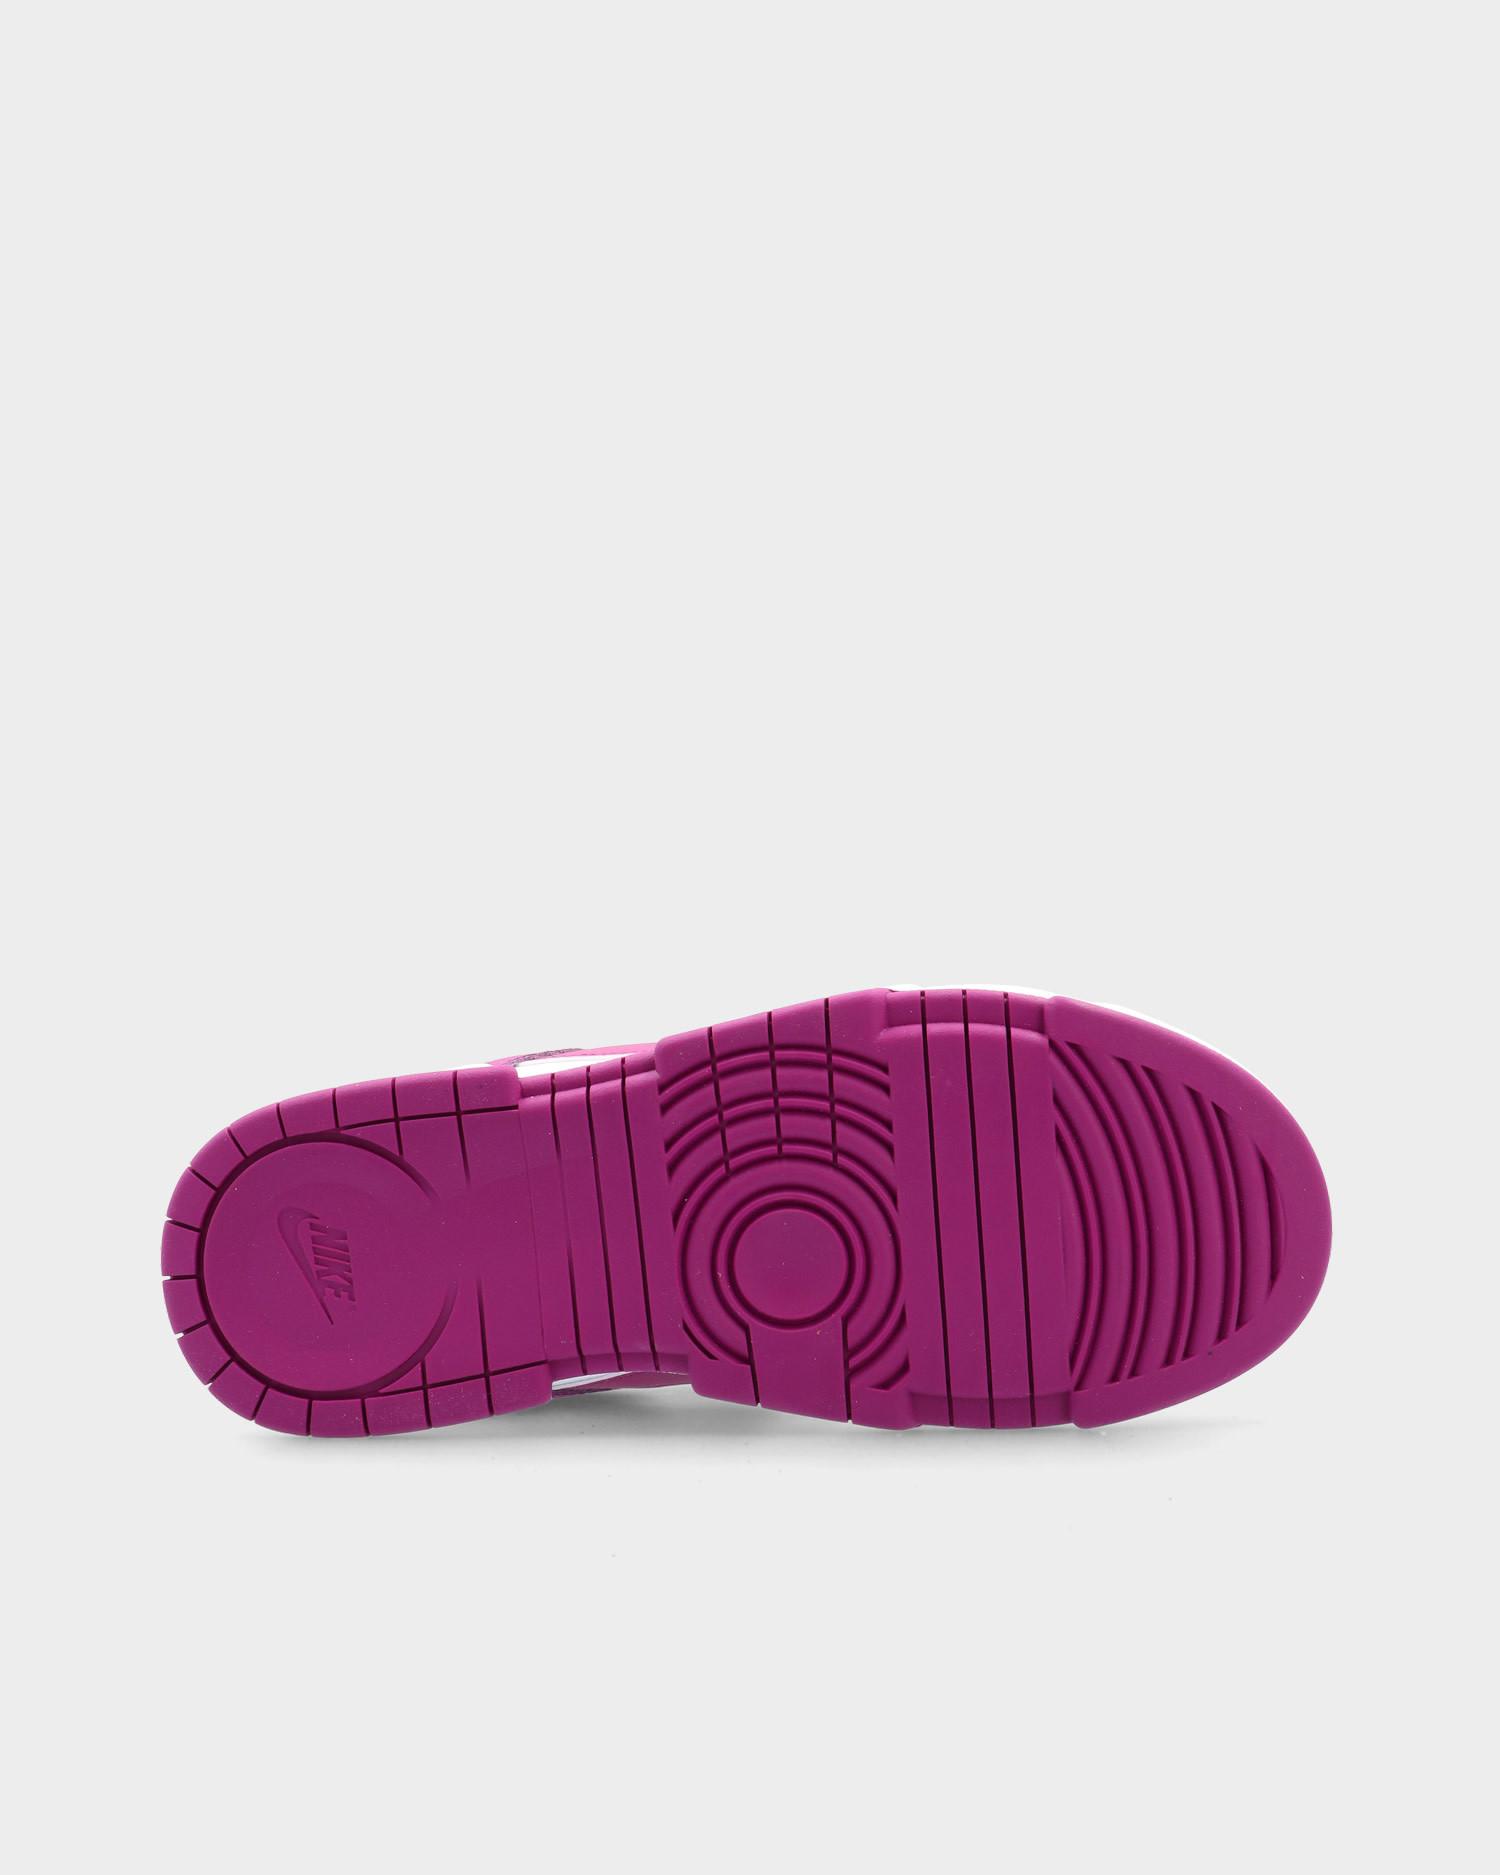 Nike Dunk Low Disrupt White/red plum